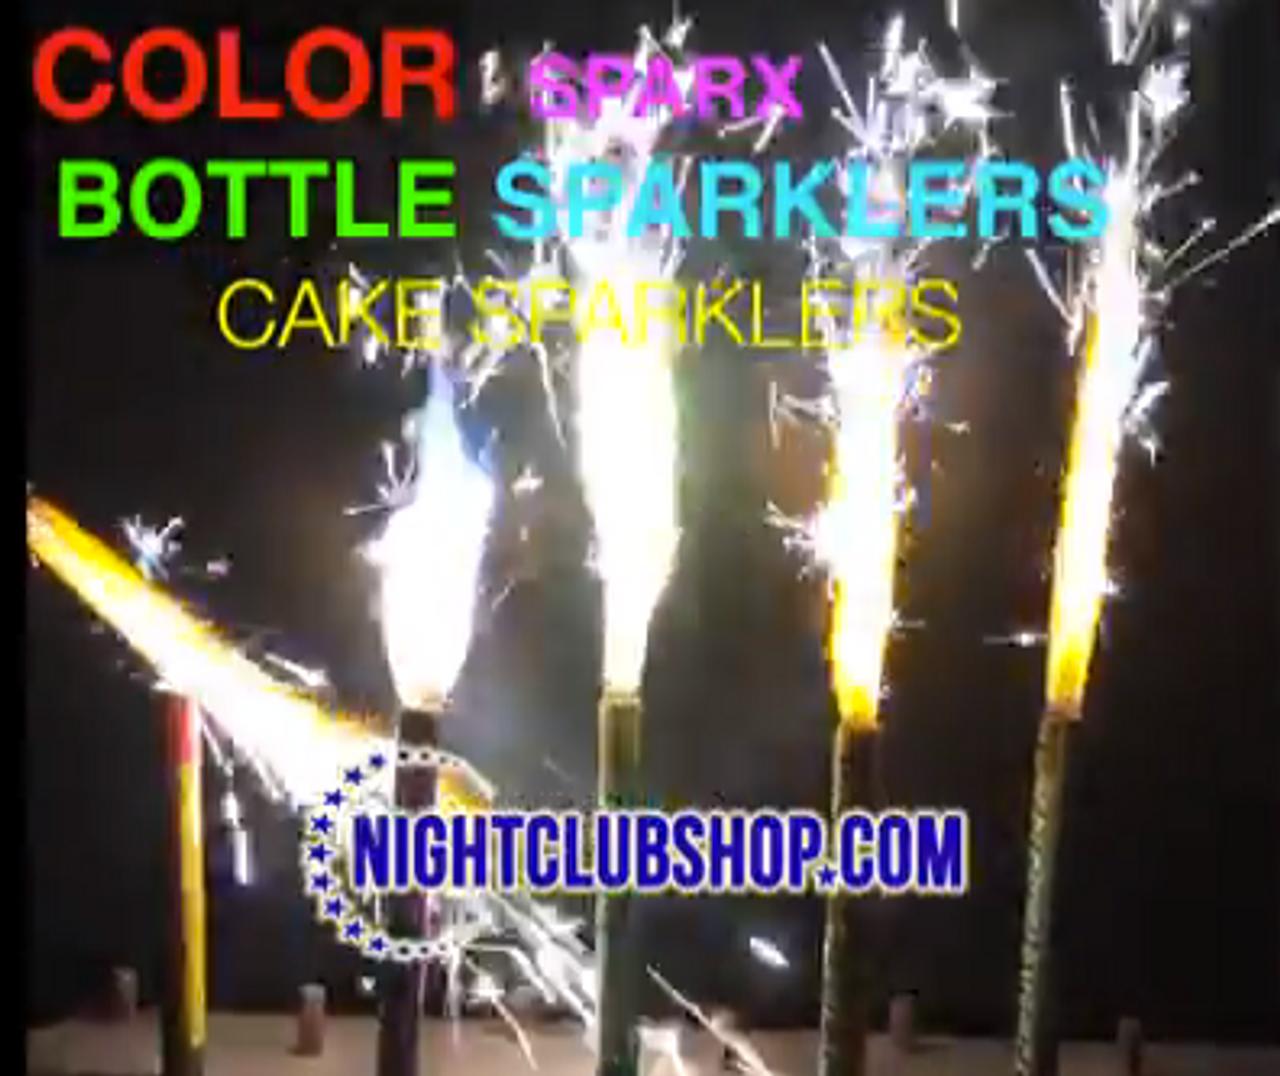 Color, Sparkler, Color, sparkler, Color, sparkler, color Sparkler, Color Sparkler